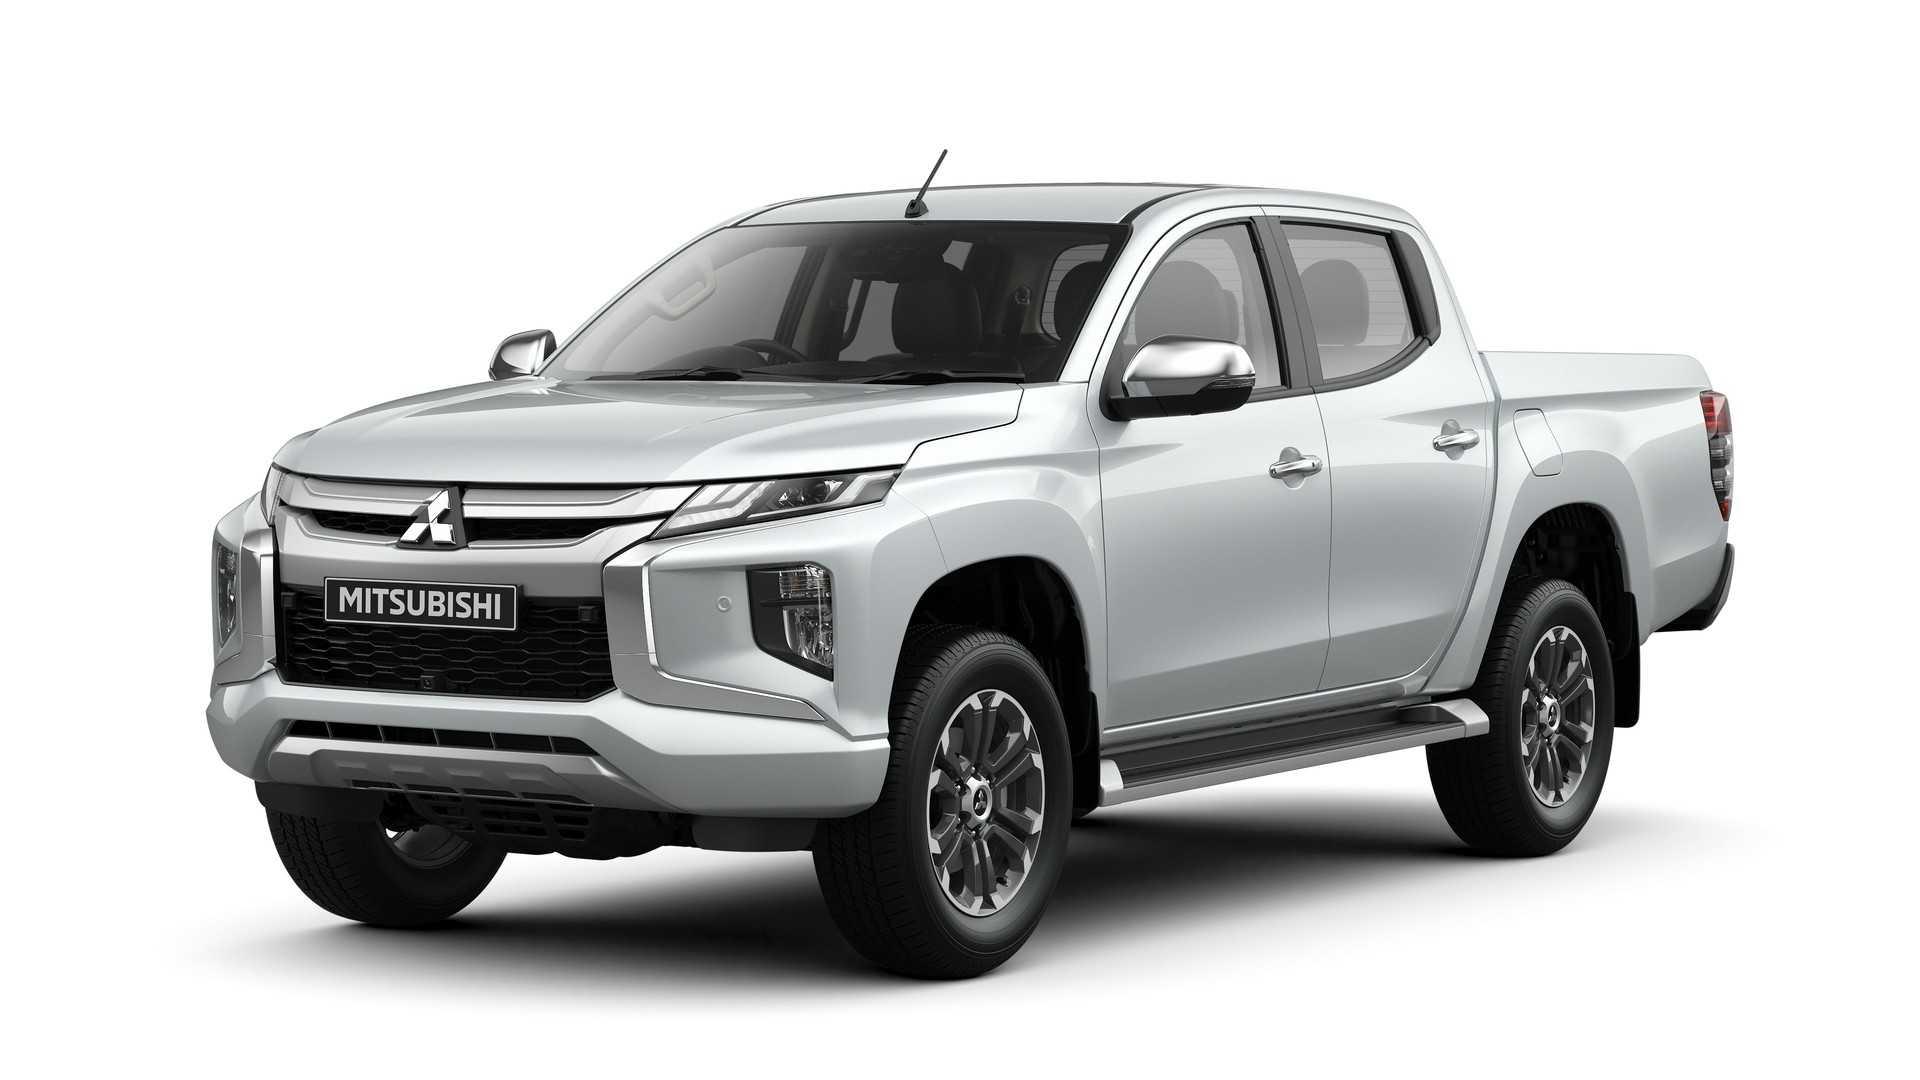 2021 Mitsubishi L200 Price